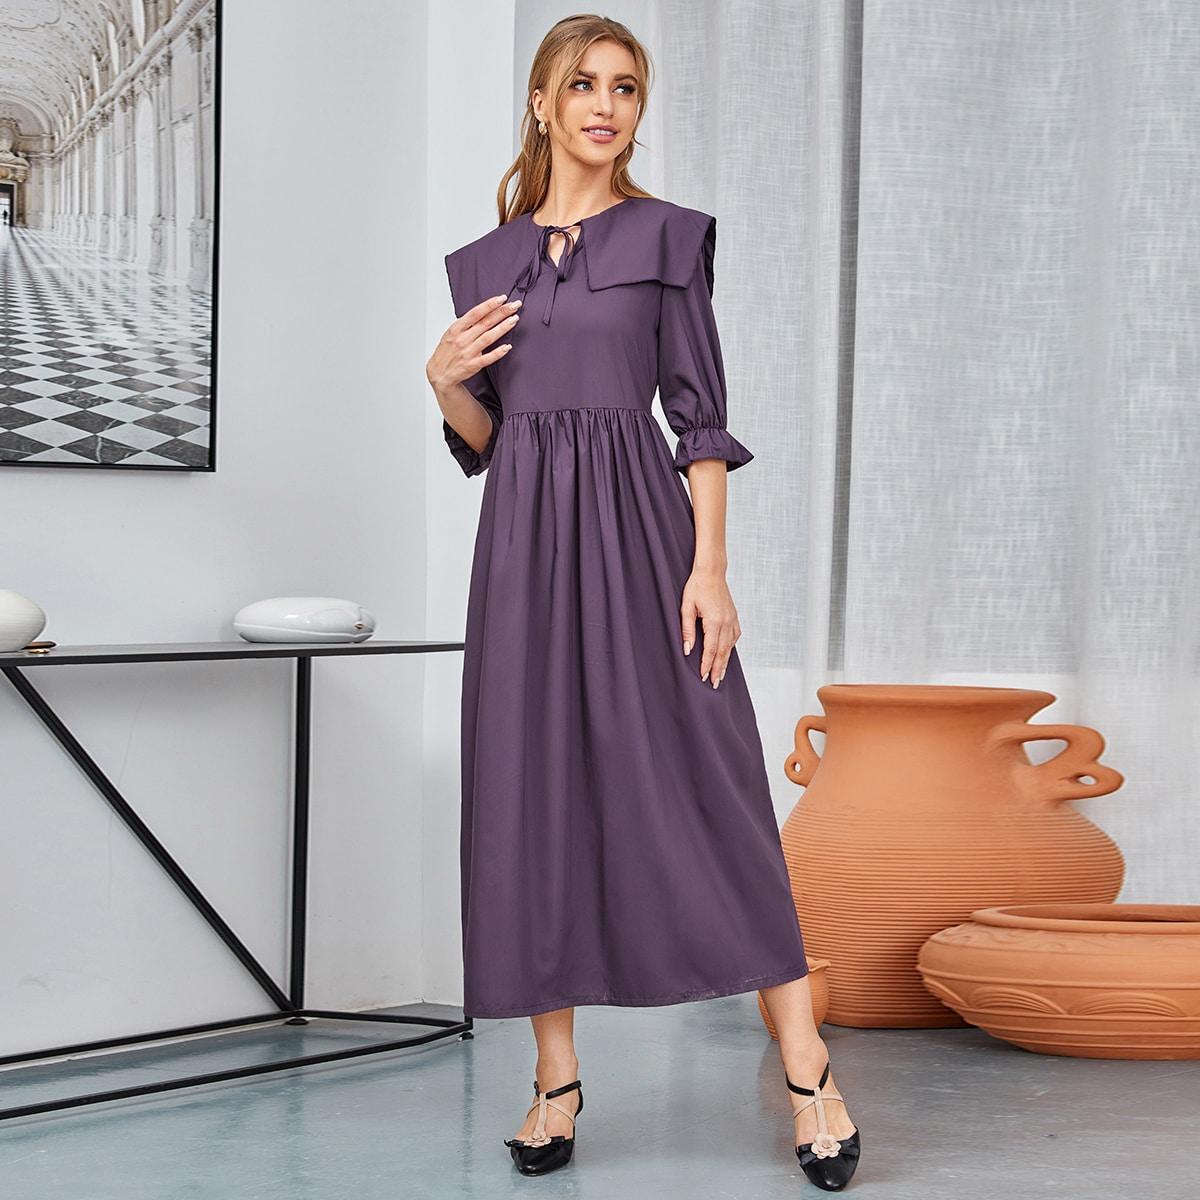 Платье с воланами на рукавах SheIn swdress01201224982